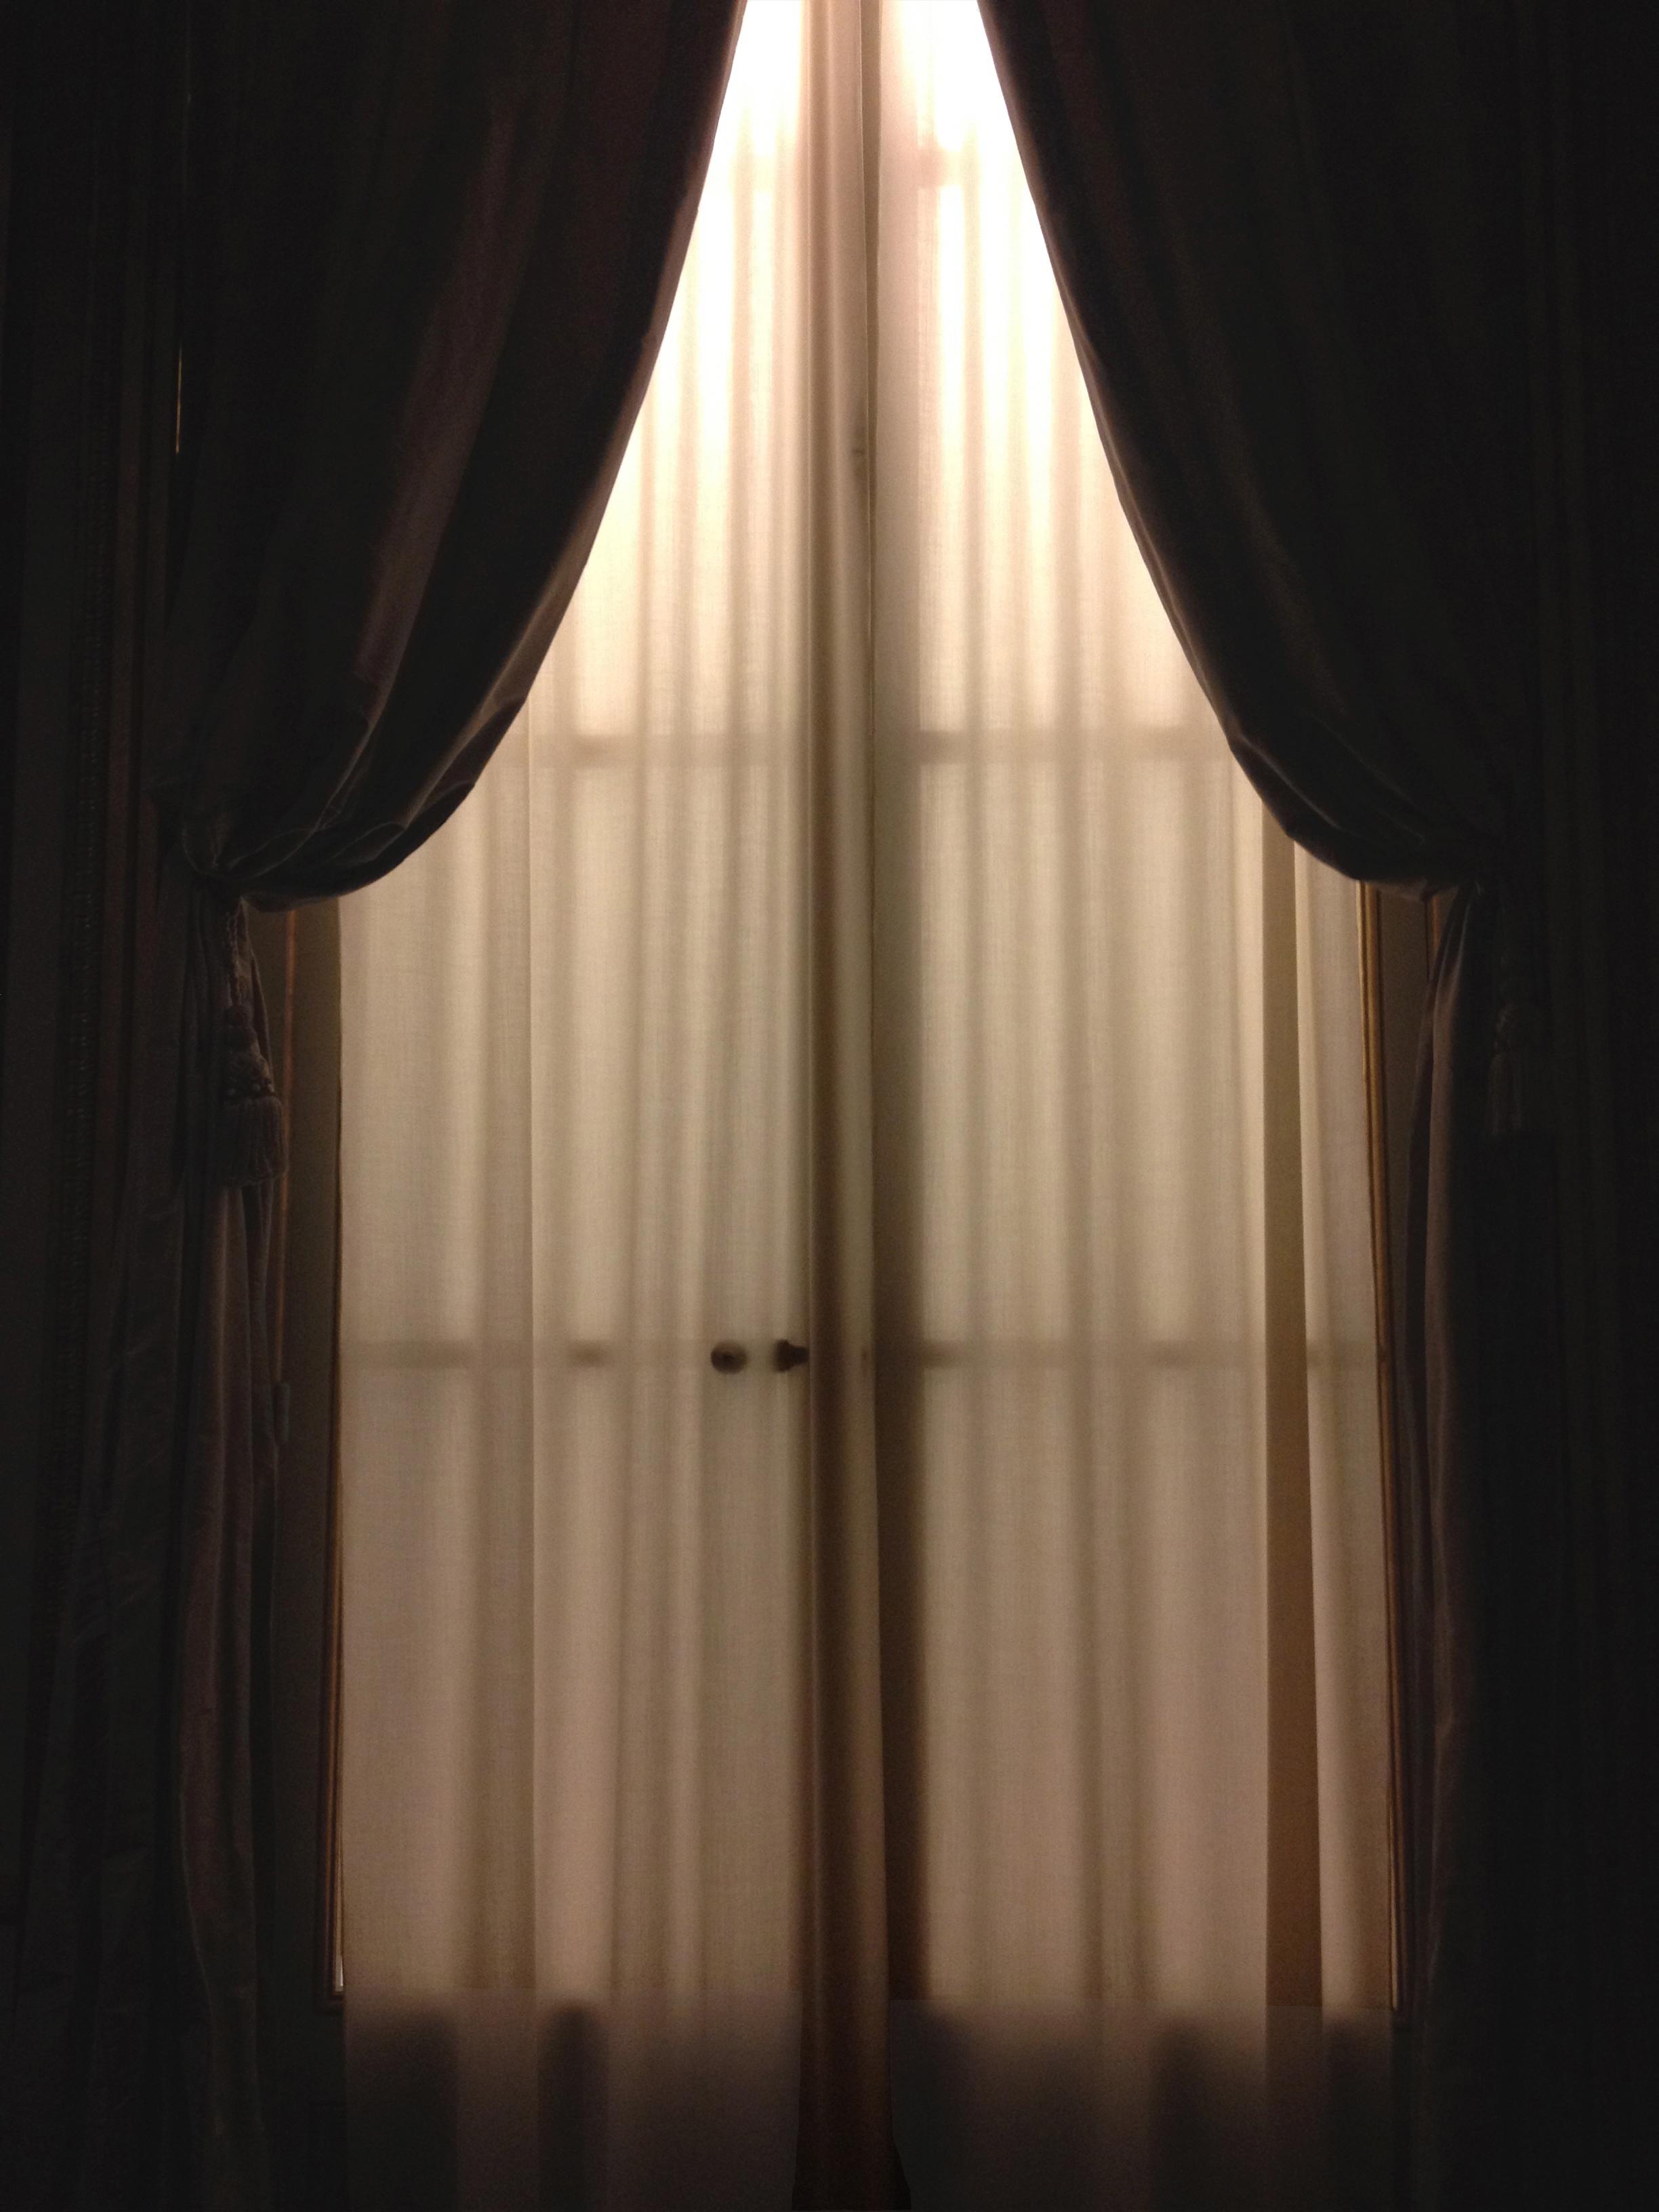 PSed curtain vibrance+brightcontrast.jpg